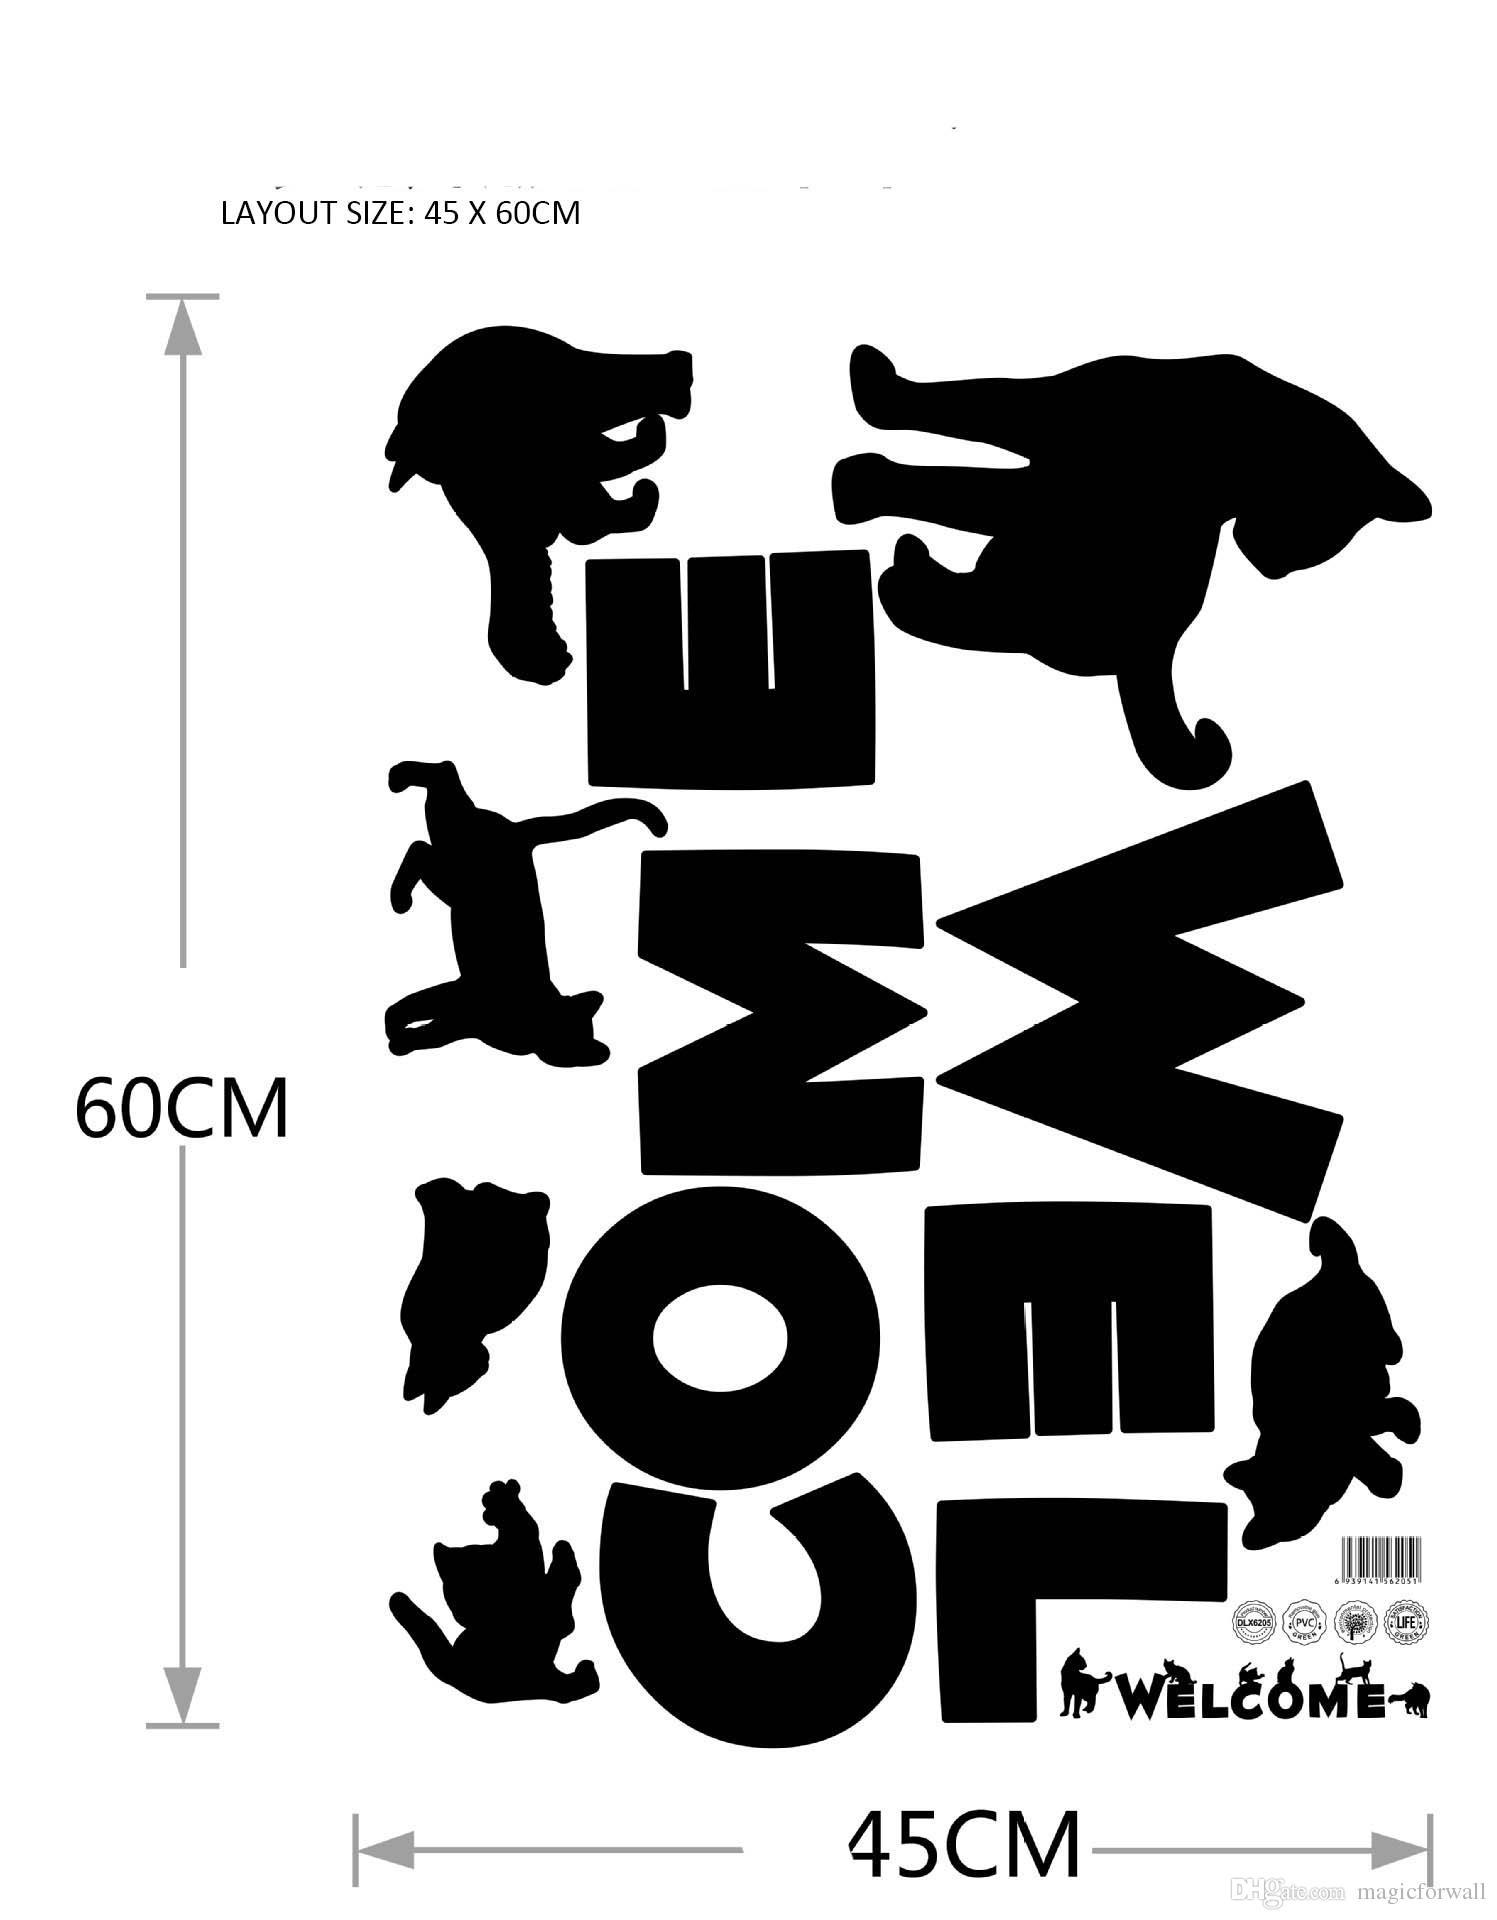 Black Cat Wall Art Decal Sticker English Words Welcome Store Door Window Decoration Wallpaper Decal Poster Creative Glass Window Decor